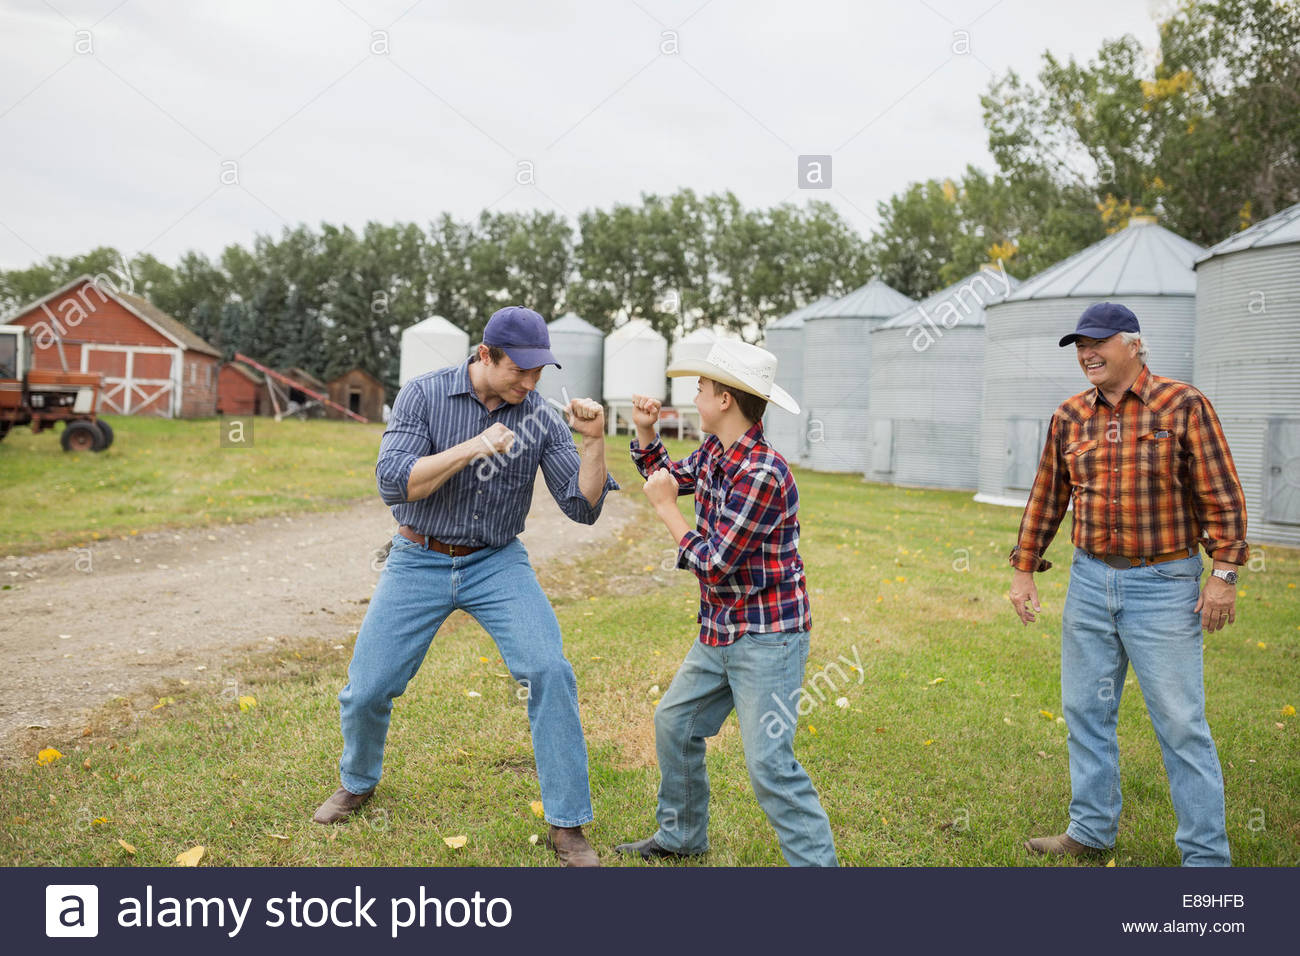 Padre e hijo jugar combates en la granja Imagen De Stock